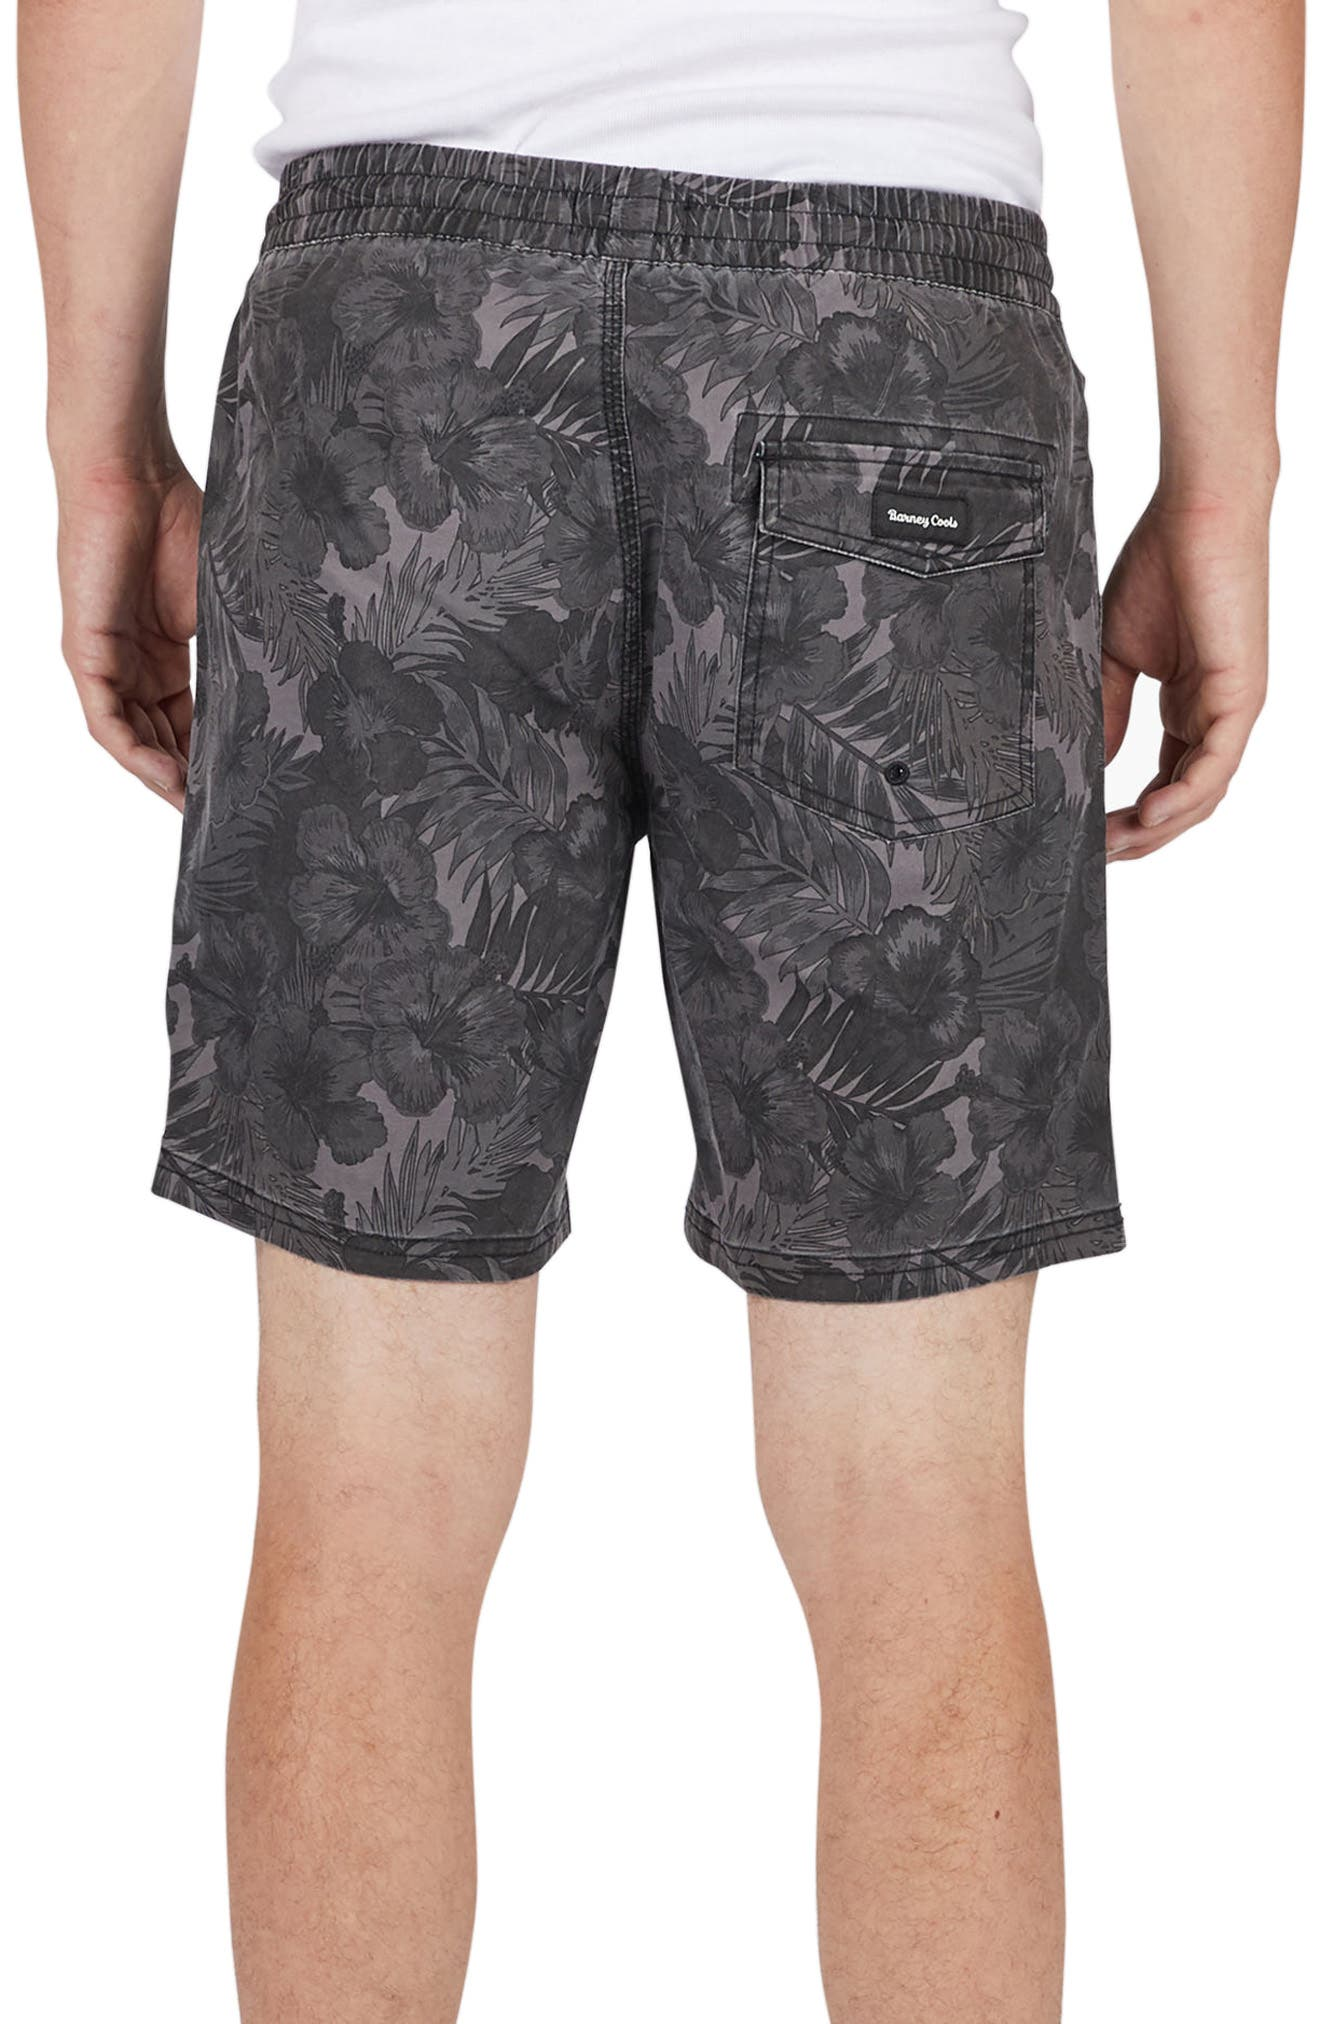 Amphibious Shorts,                             Alternate thumbnail 2, color,                             001